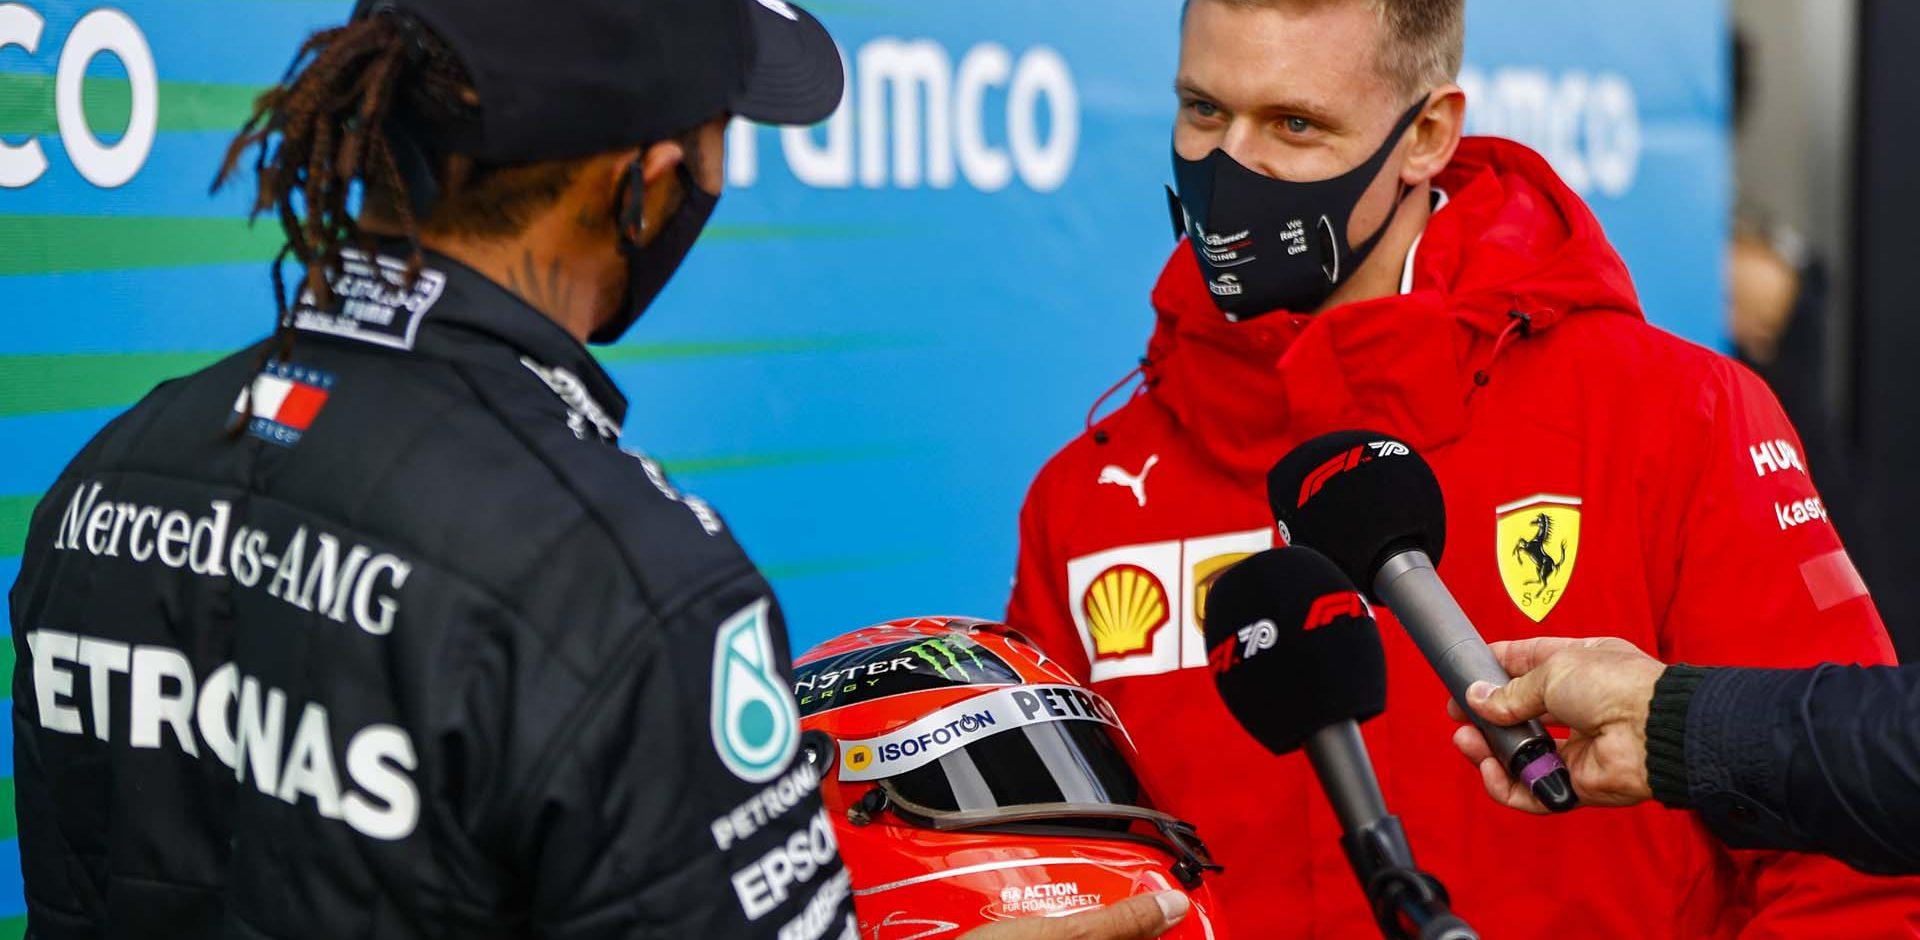 2020 Eifel Grand Prix, Sunday - LAT Images Lewis Hamilton Mercedes Mick Schumacher helmet